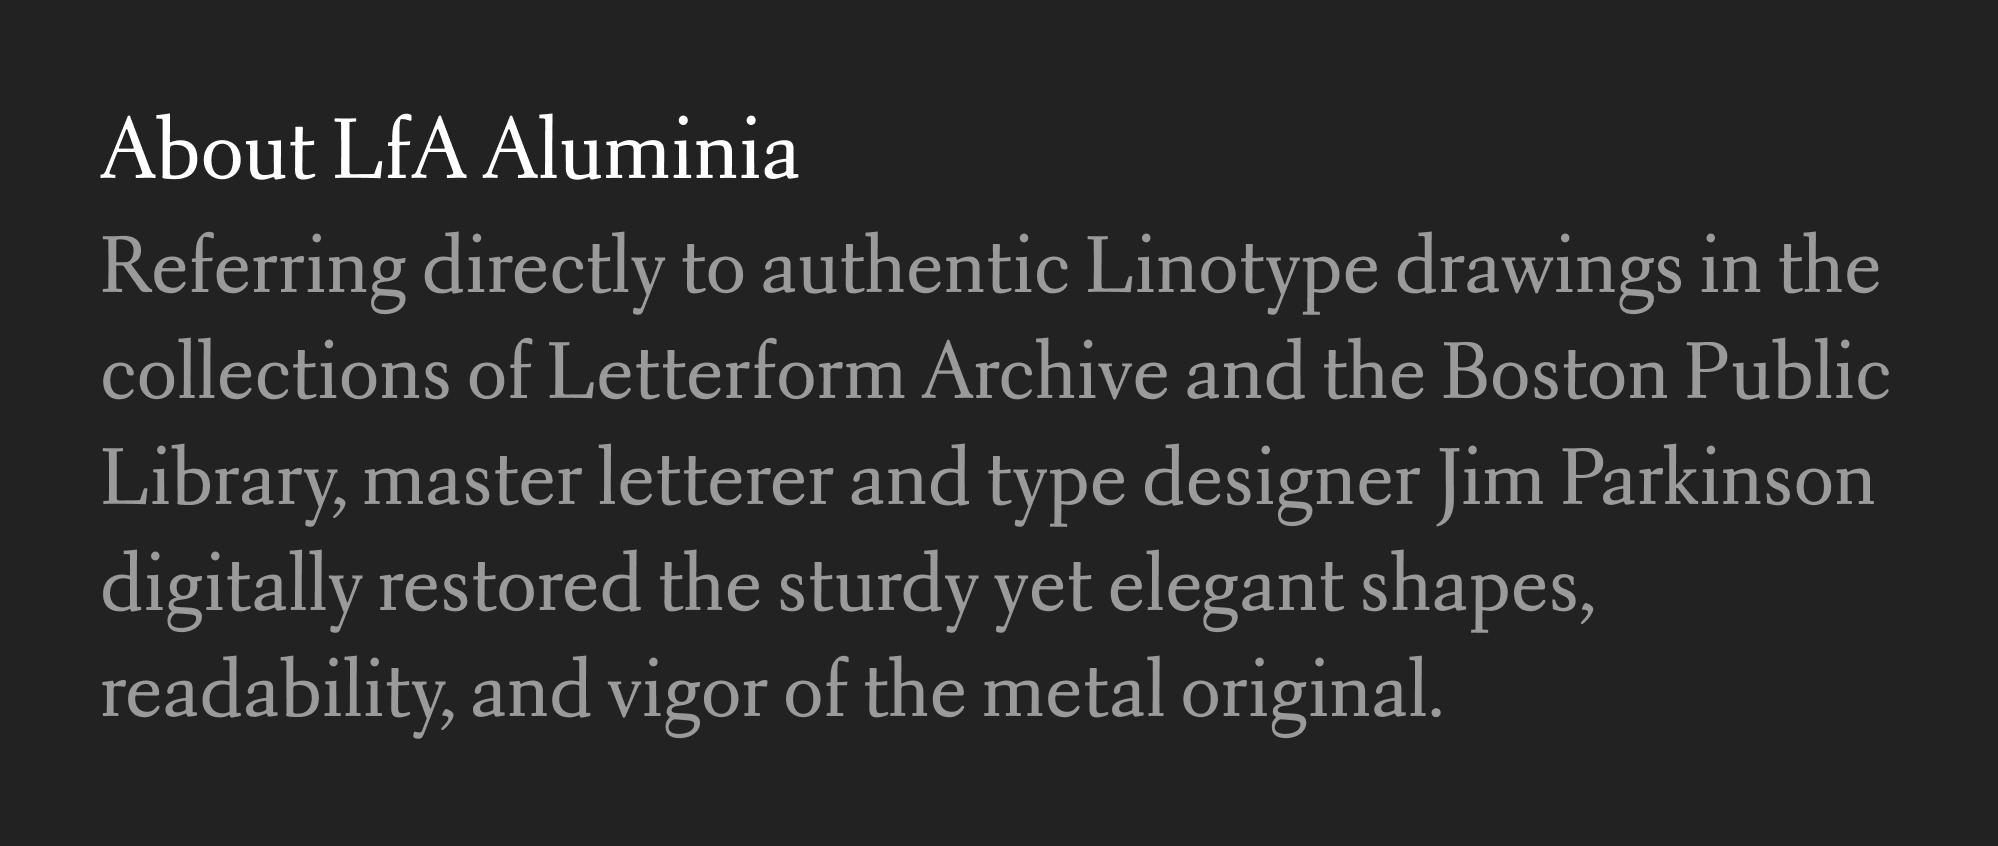 Another specimen of Aluminia